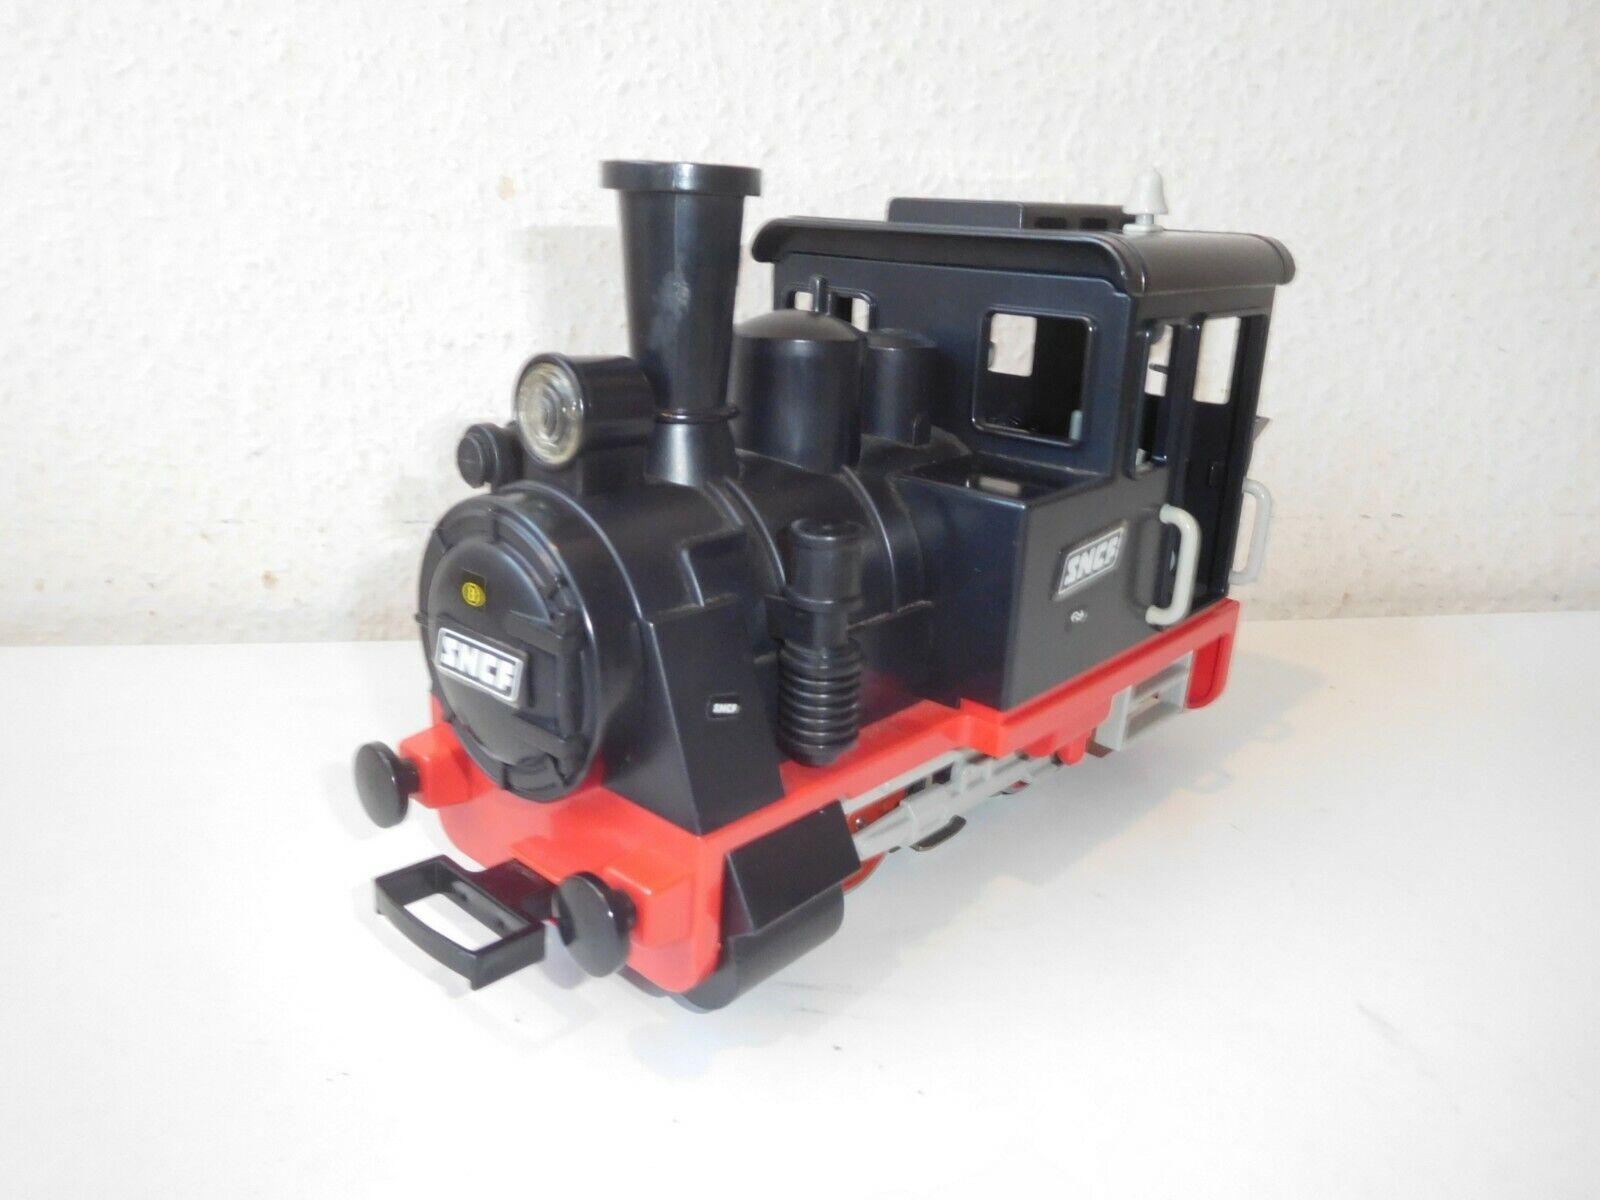 Playmobil  train locomotive LGB 4051 (4) (4) (4) fed631